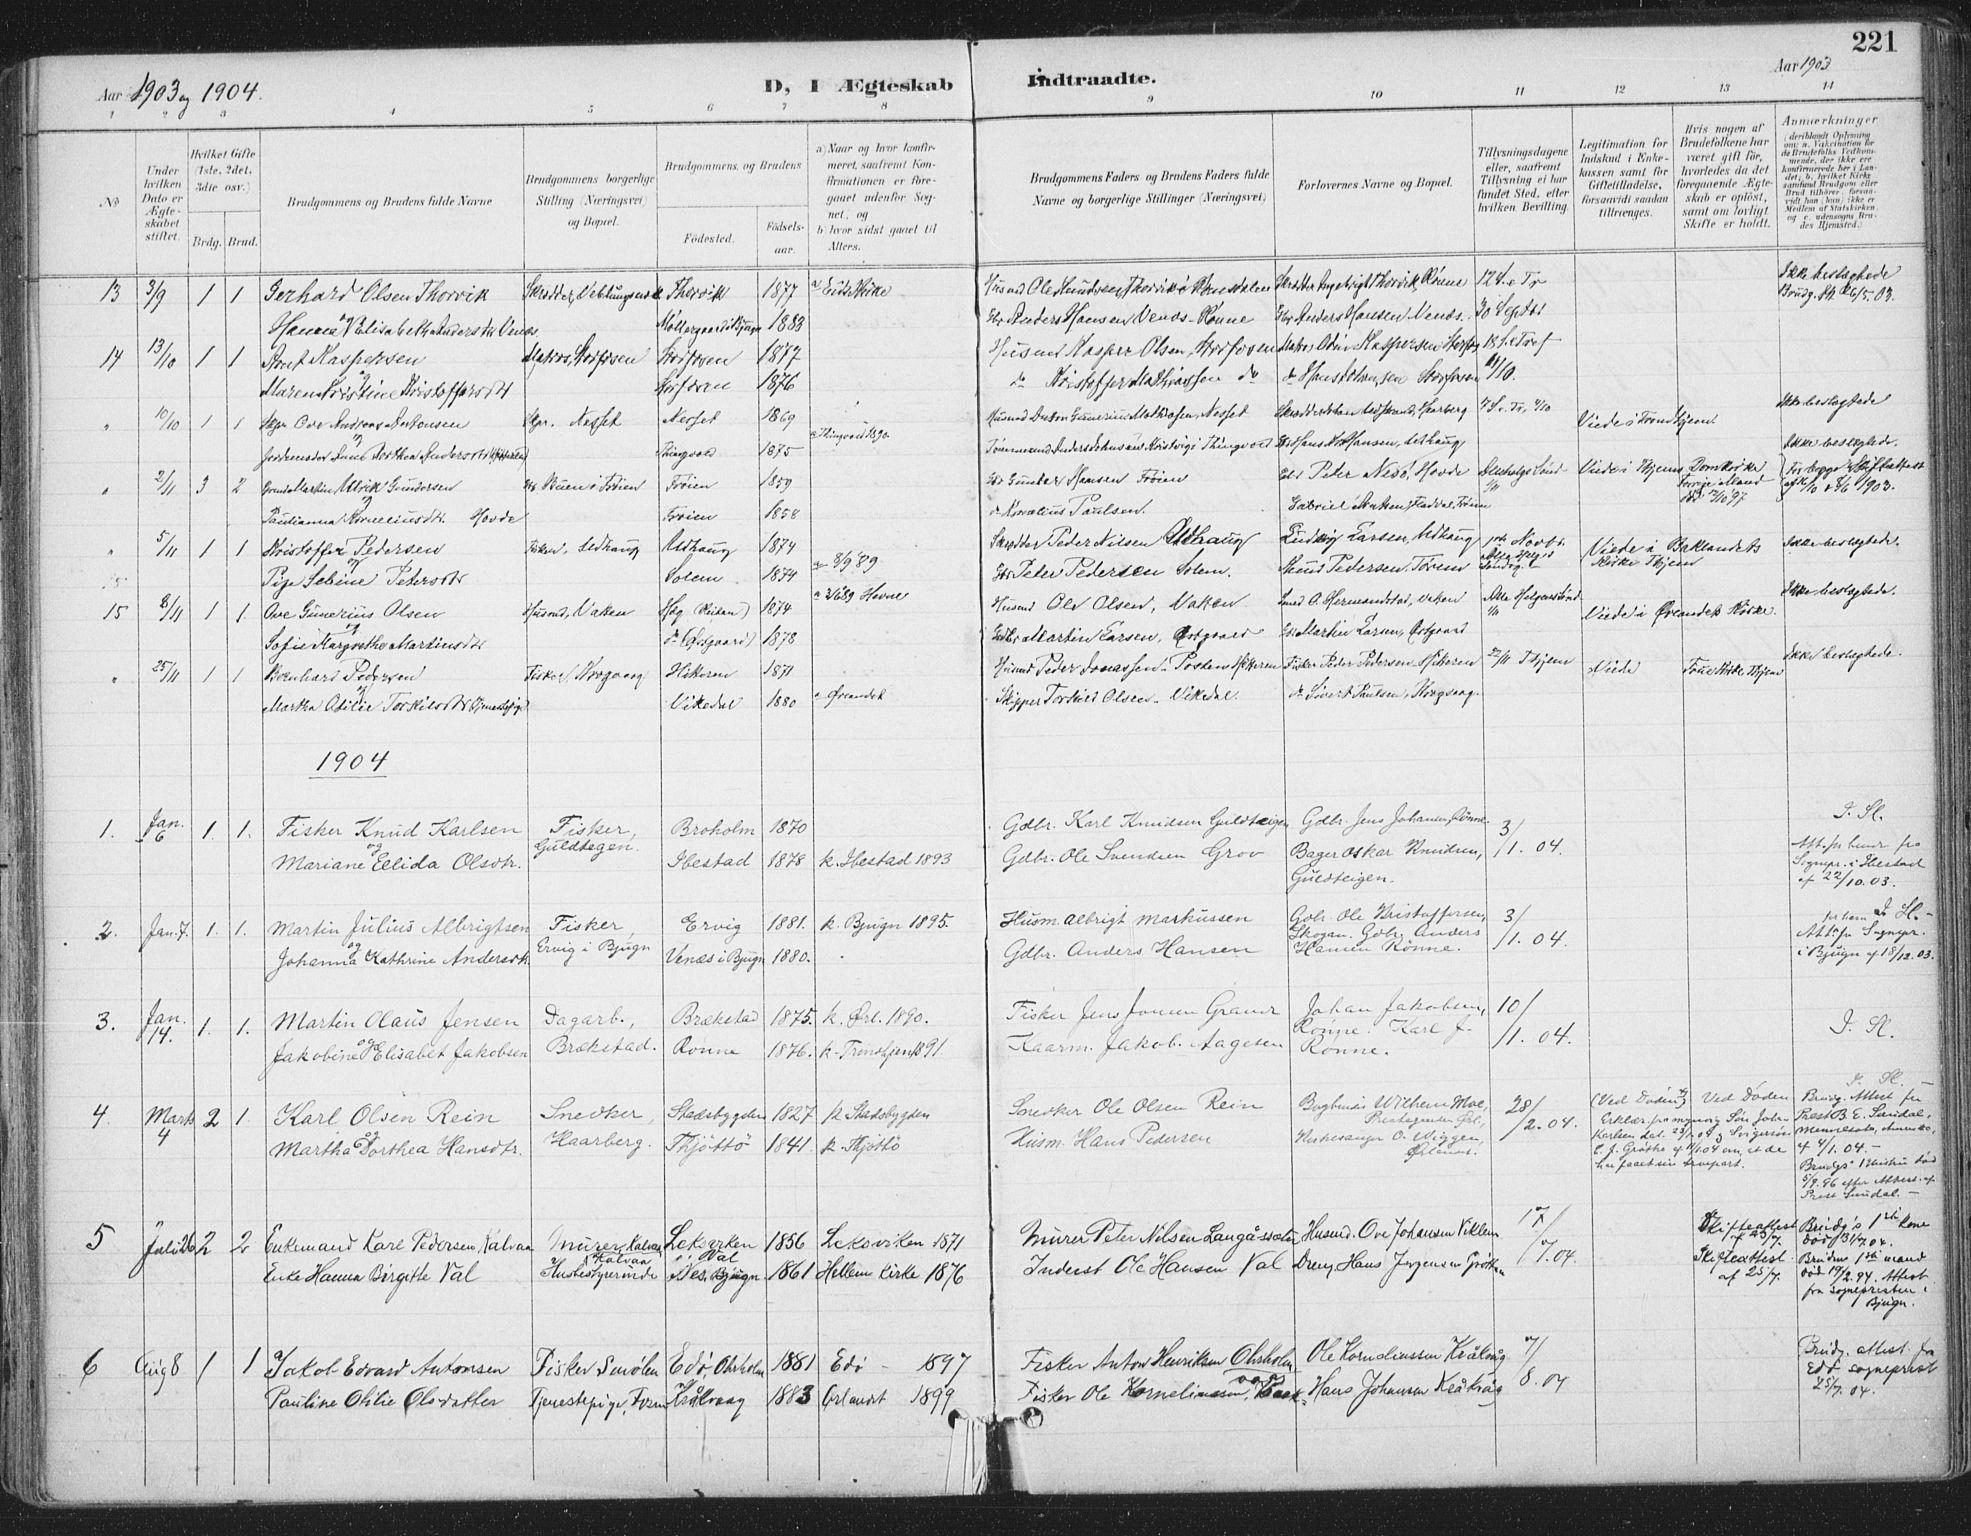 SAT, Ministerialprotokoller, klokkerbøker og fødselsregistre - Sør-Trøndelag, 659/L0743: Parish register (official) no. 659A13, 1893-1910, p. 221